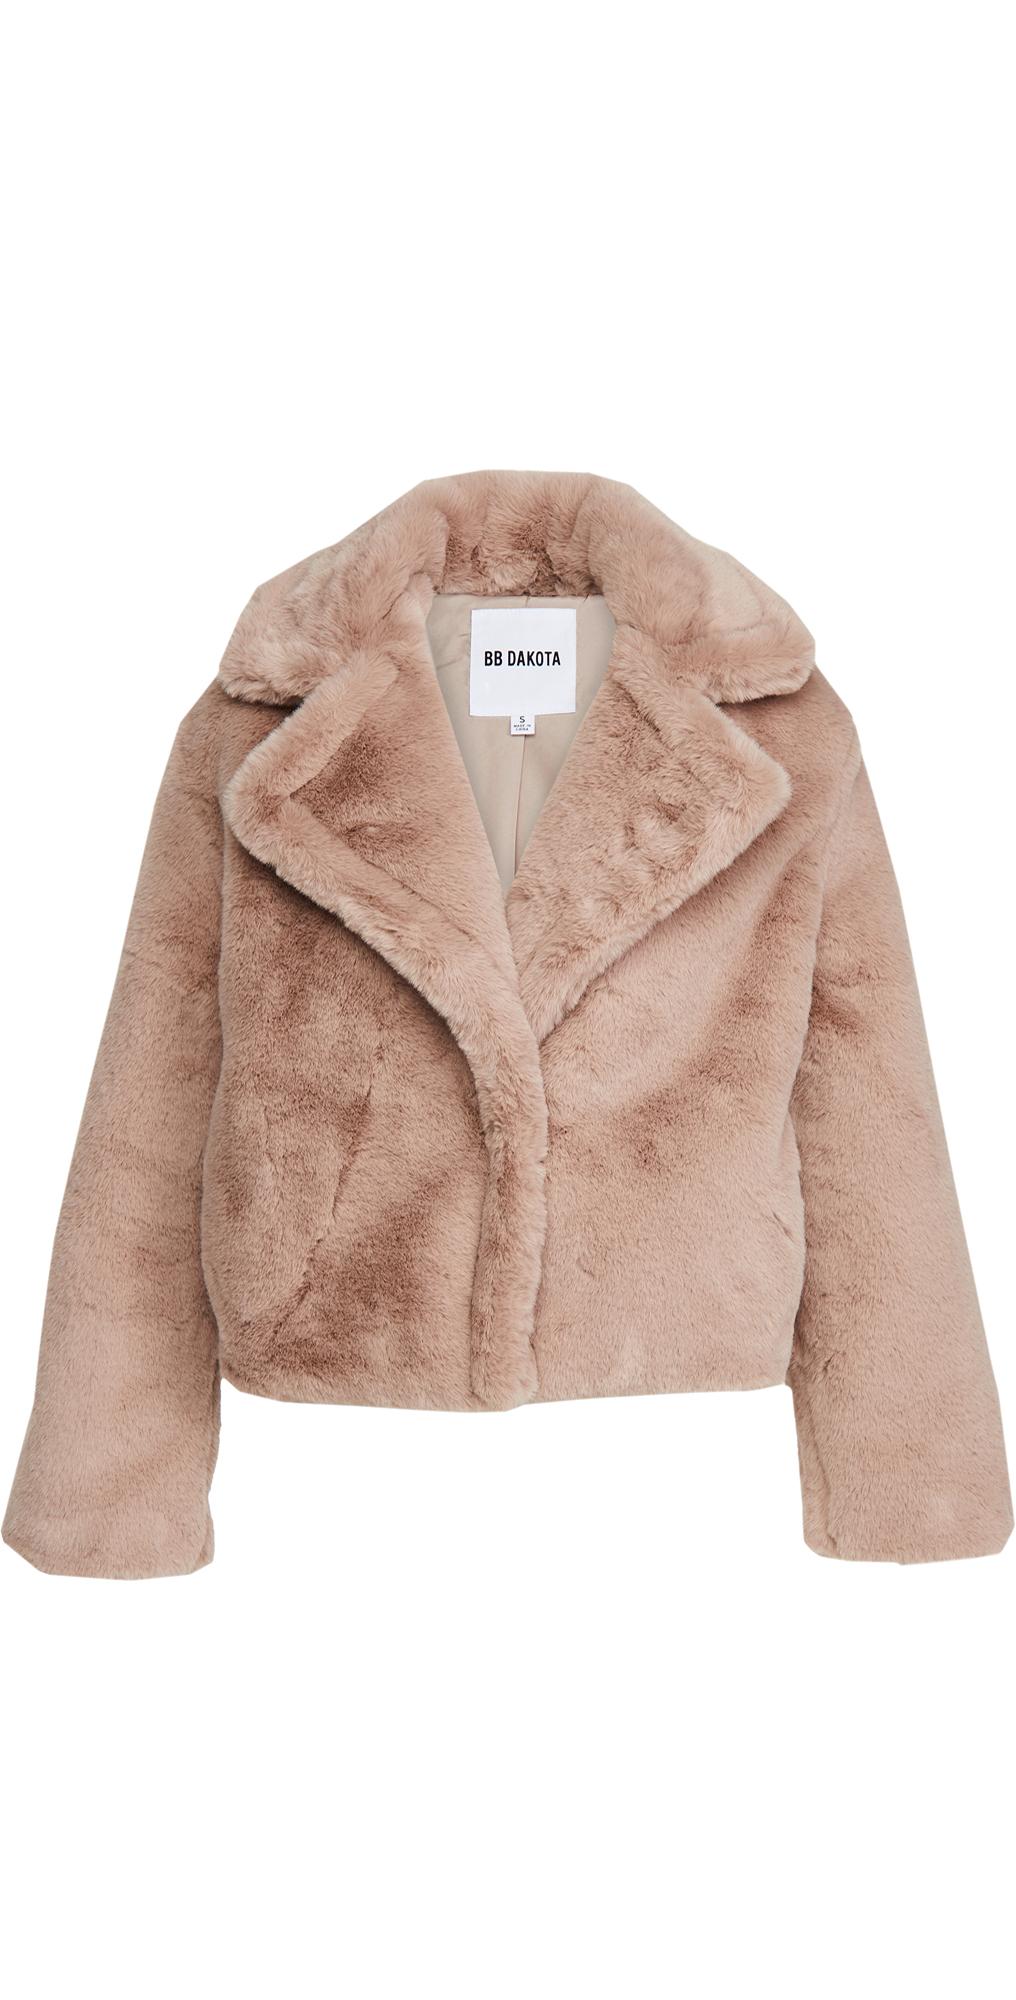 BB Dakota Big Time Plush Jacket